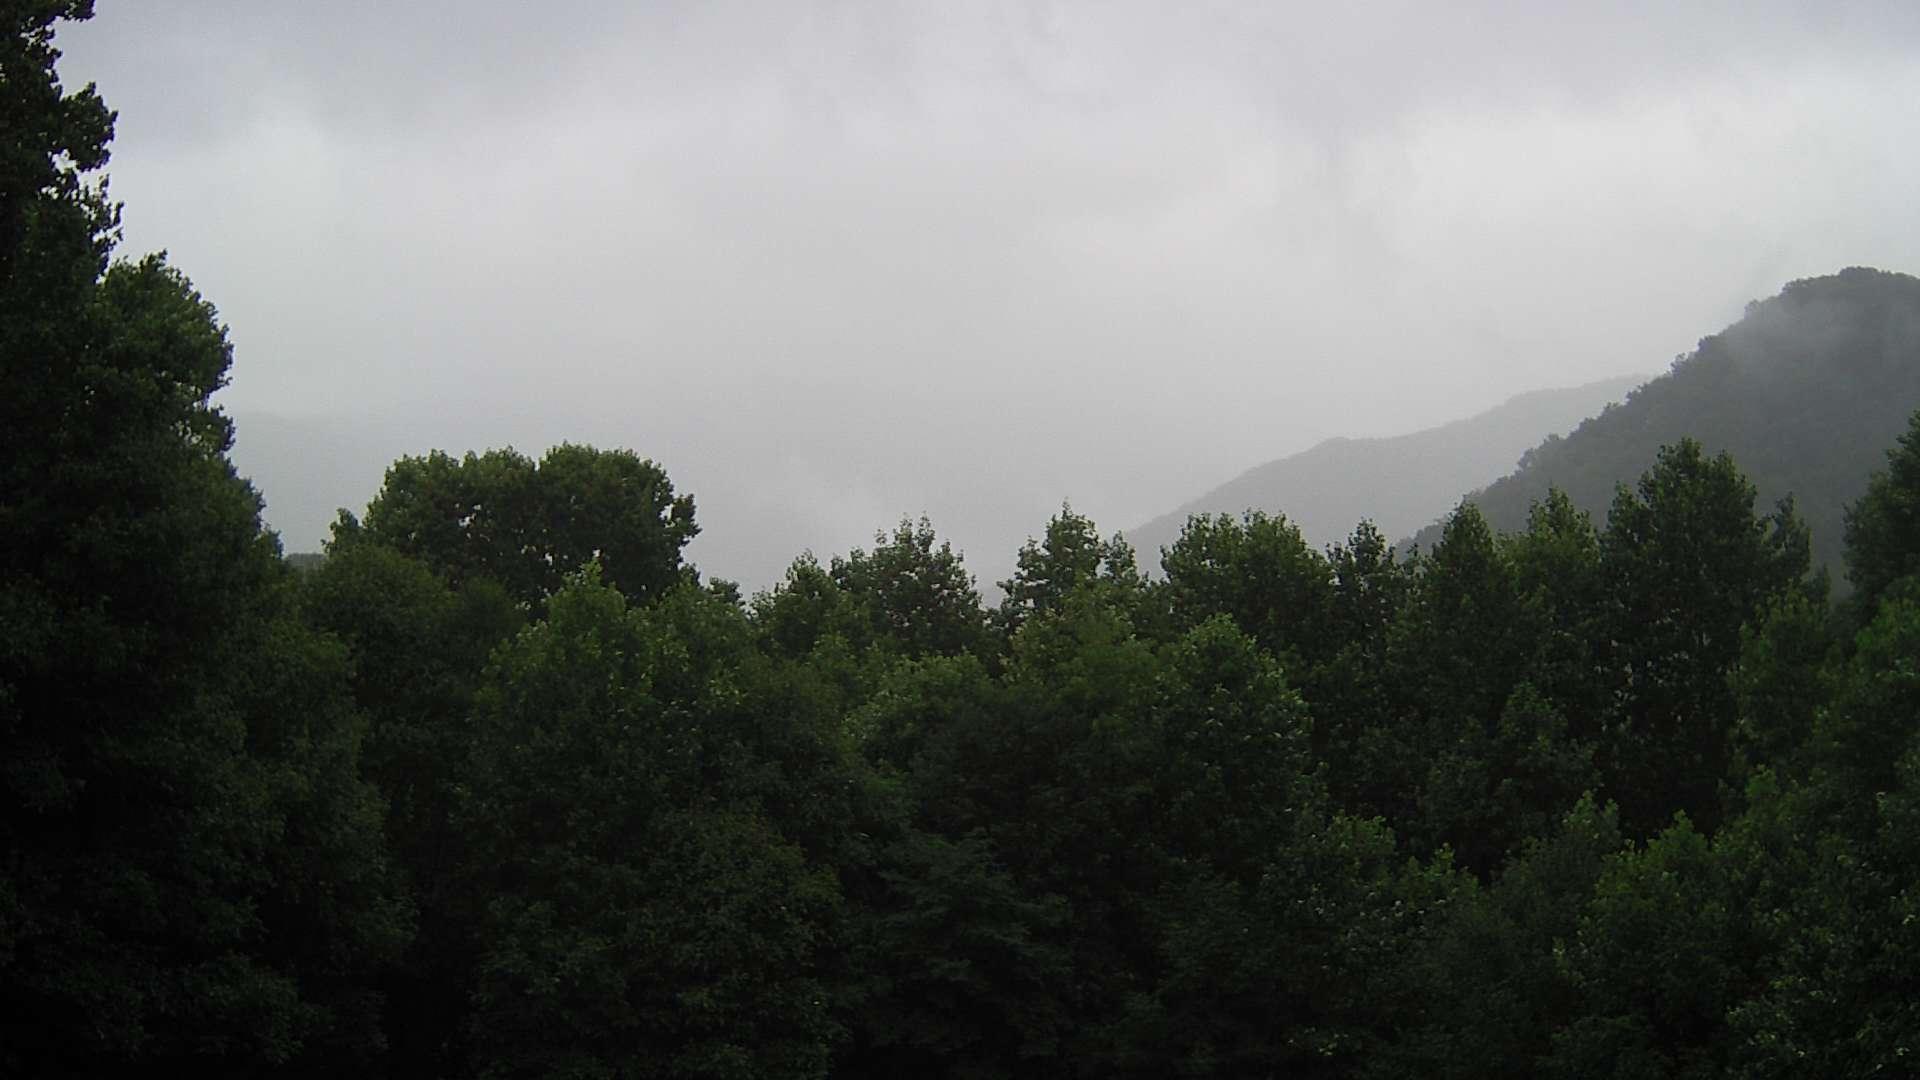 Webkamera Pensacola › South-East: United States: Black Mount